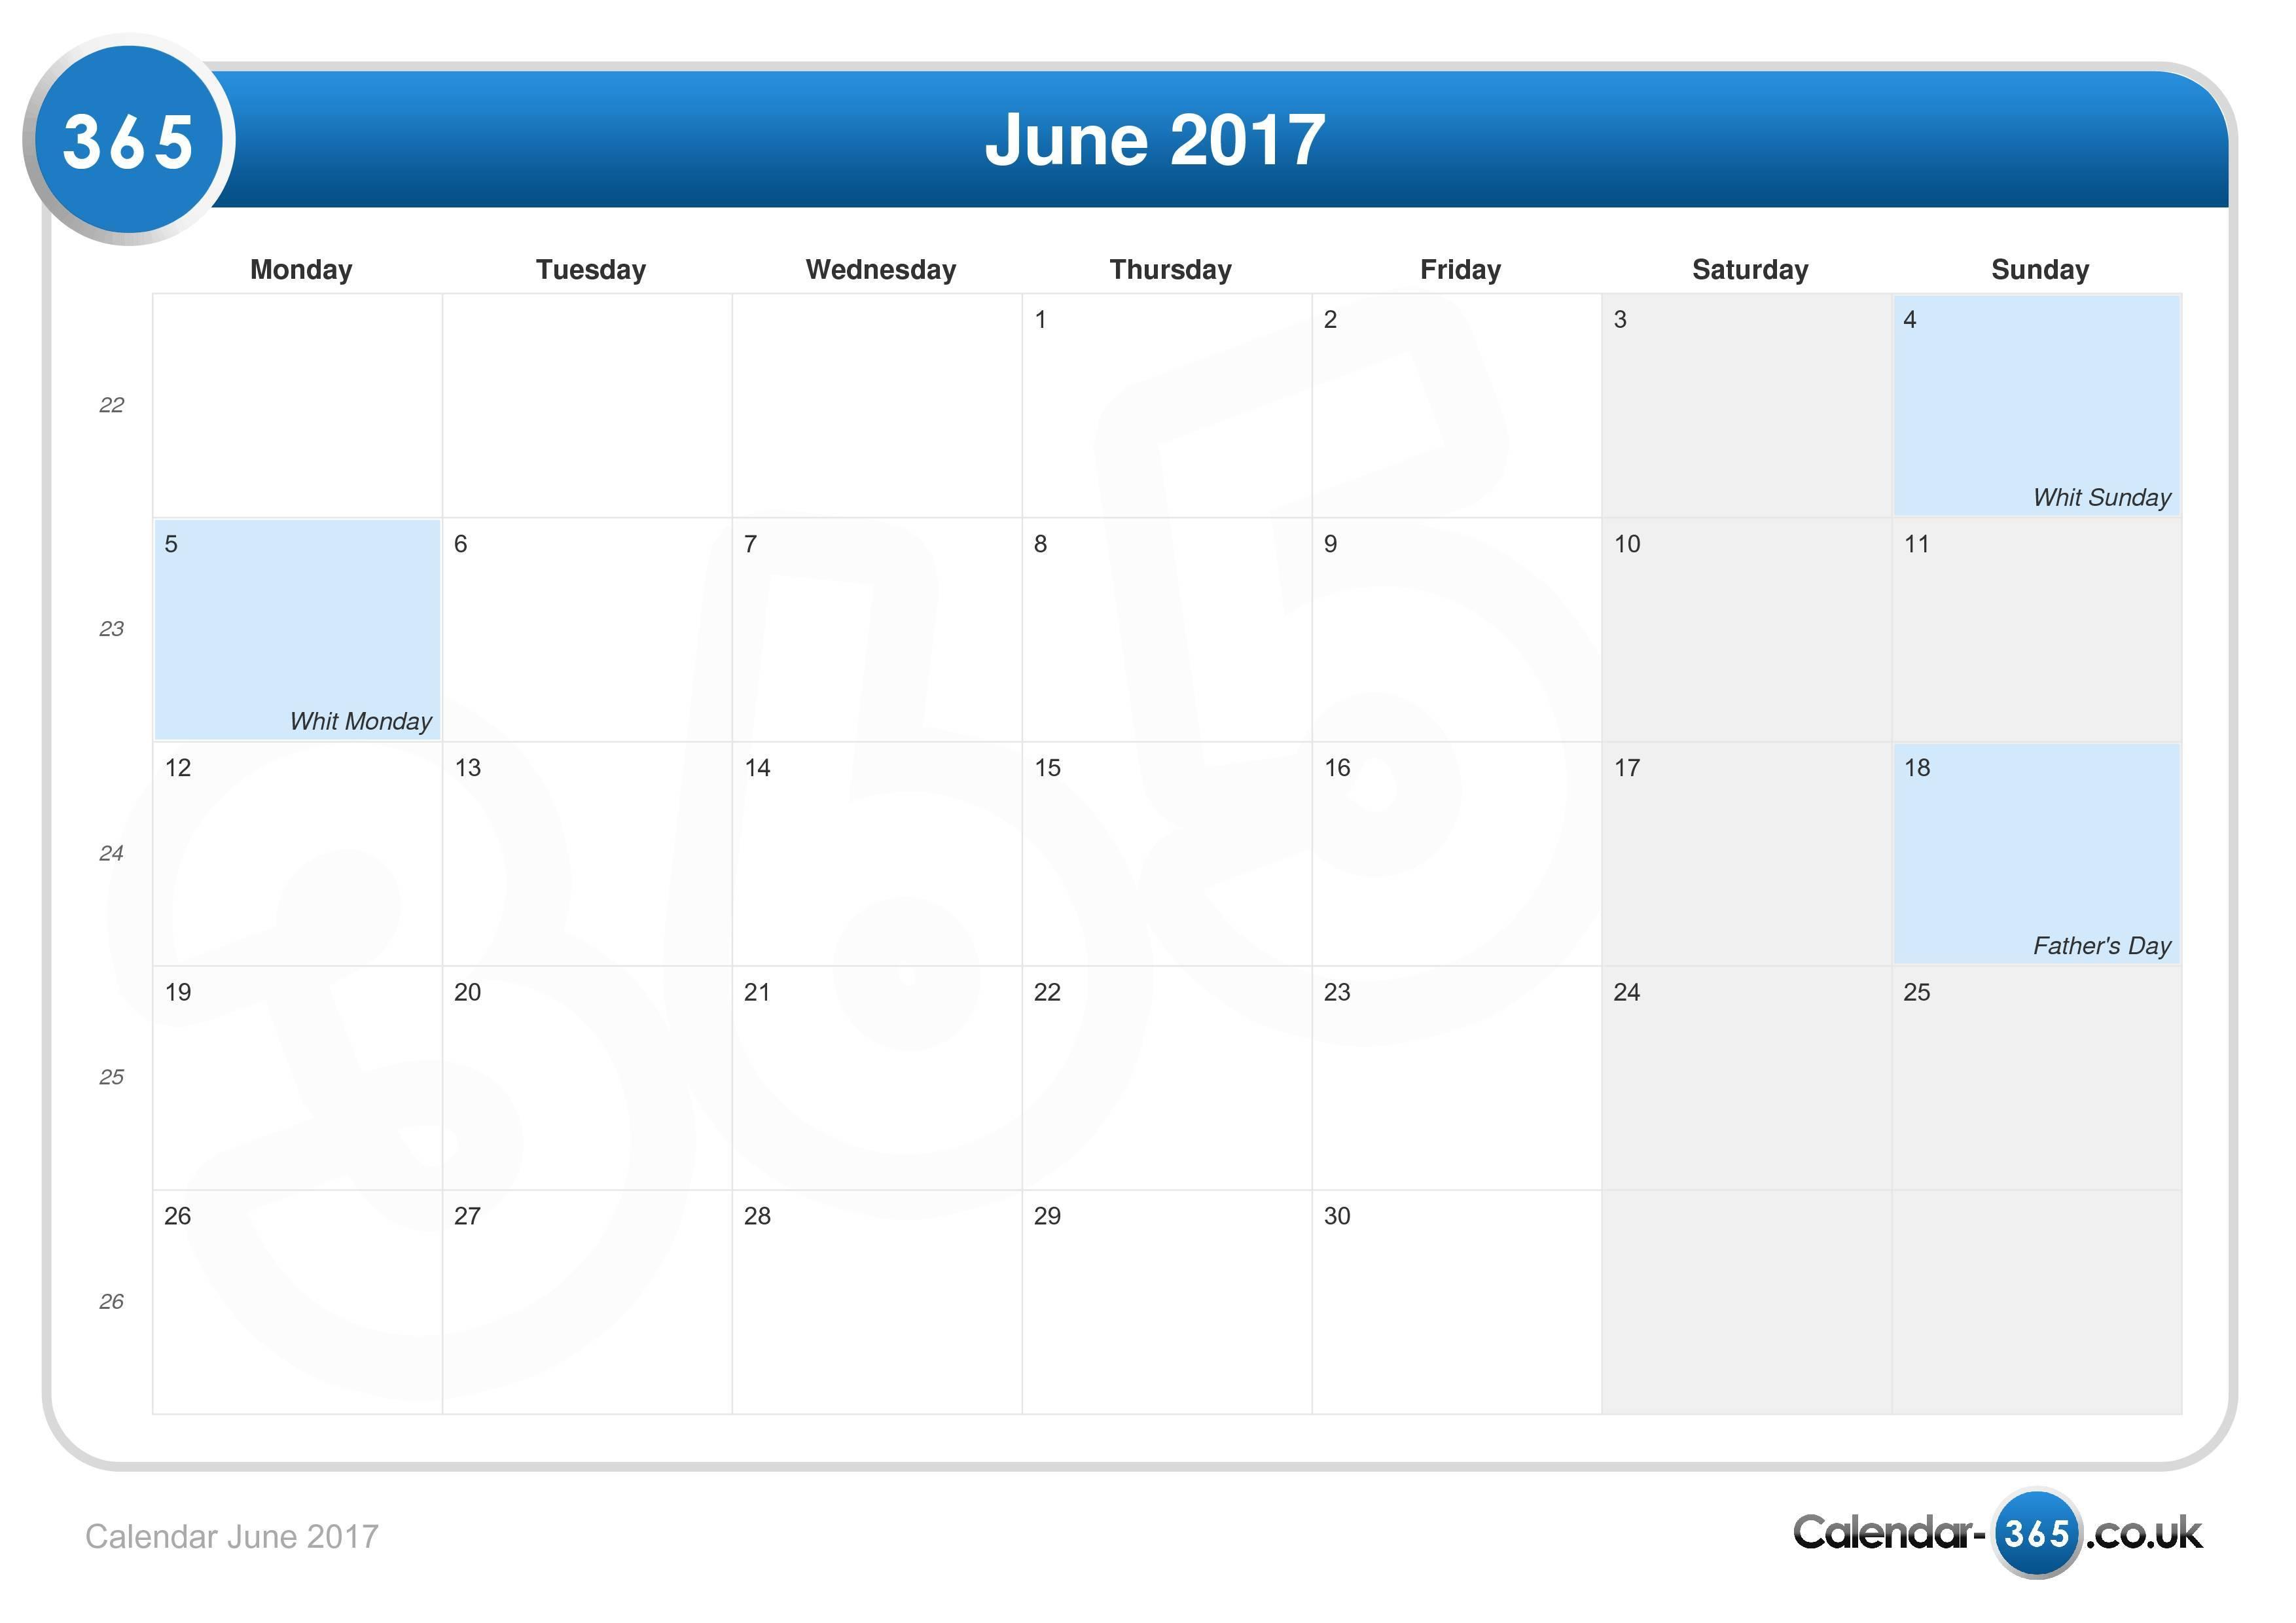 Calendar Events June Uk : Calendar june